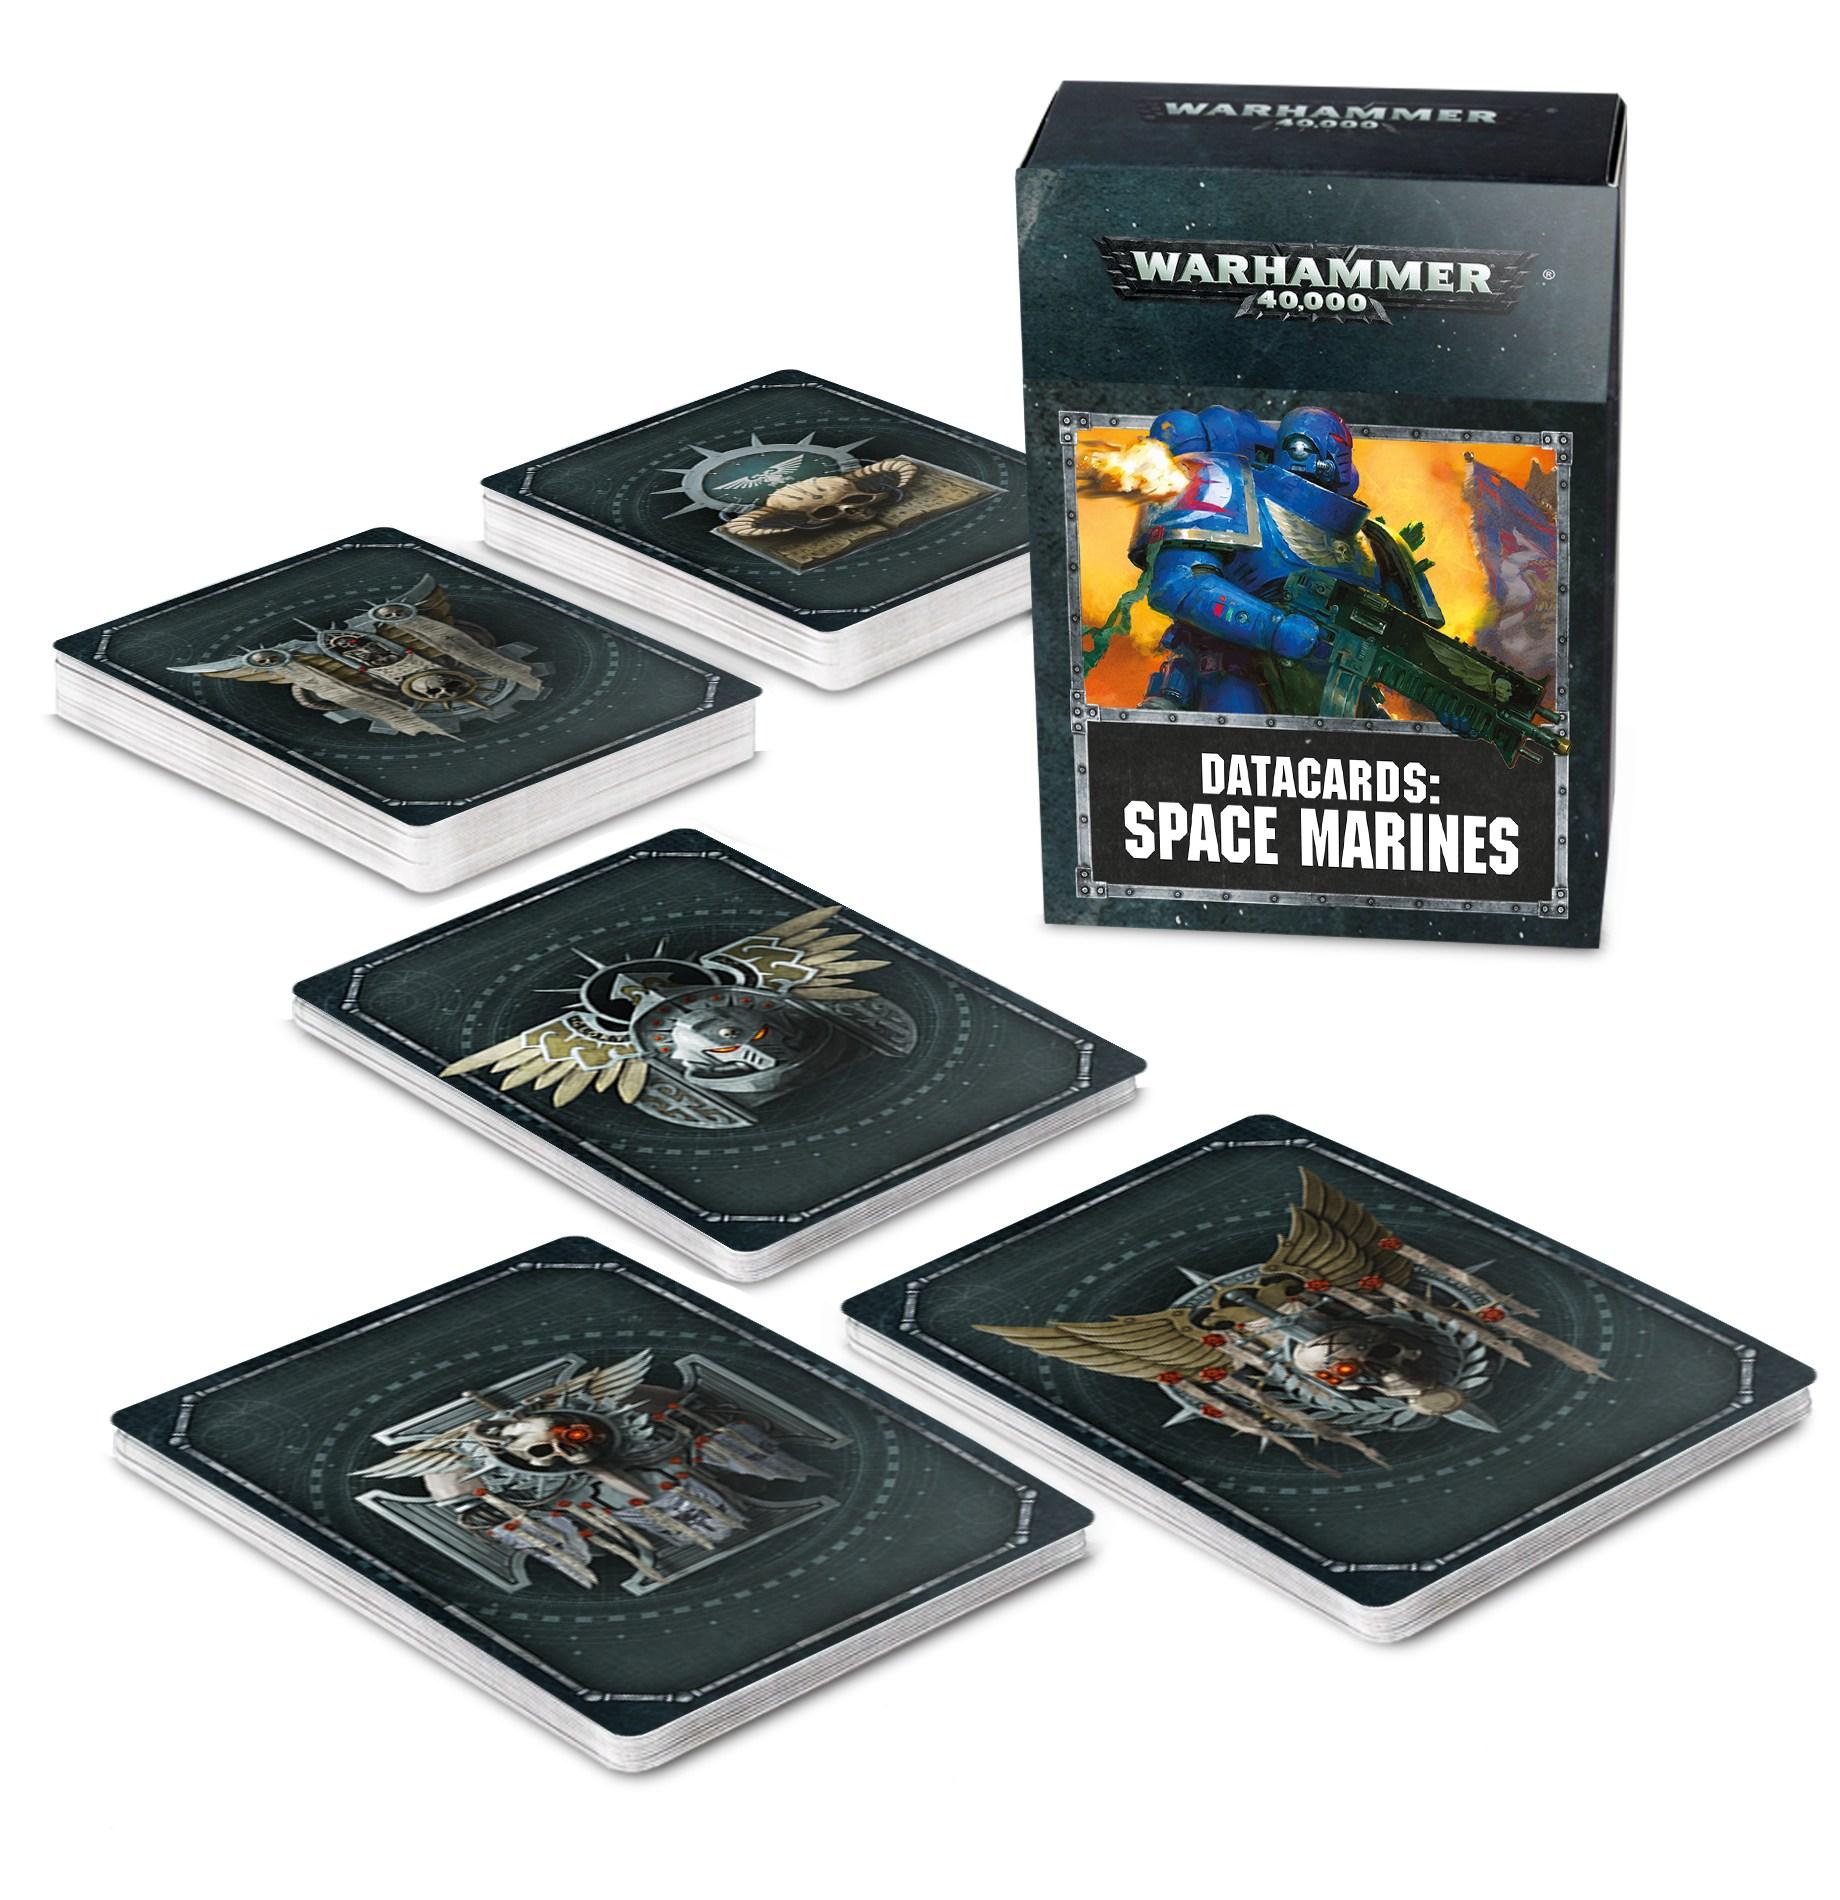 Datacards: Space Marines (2019)